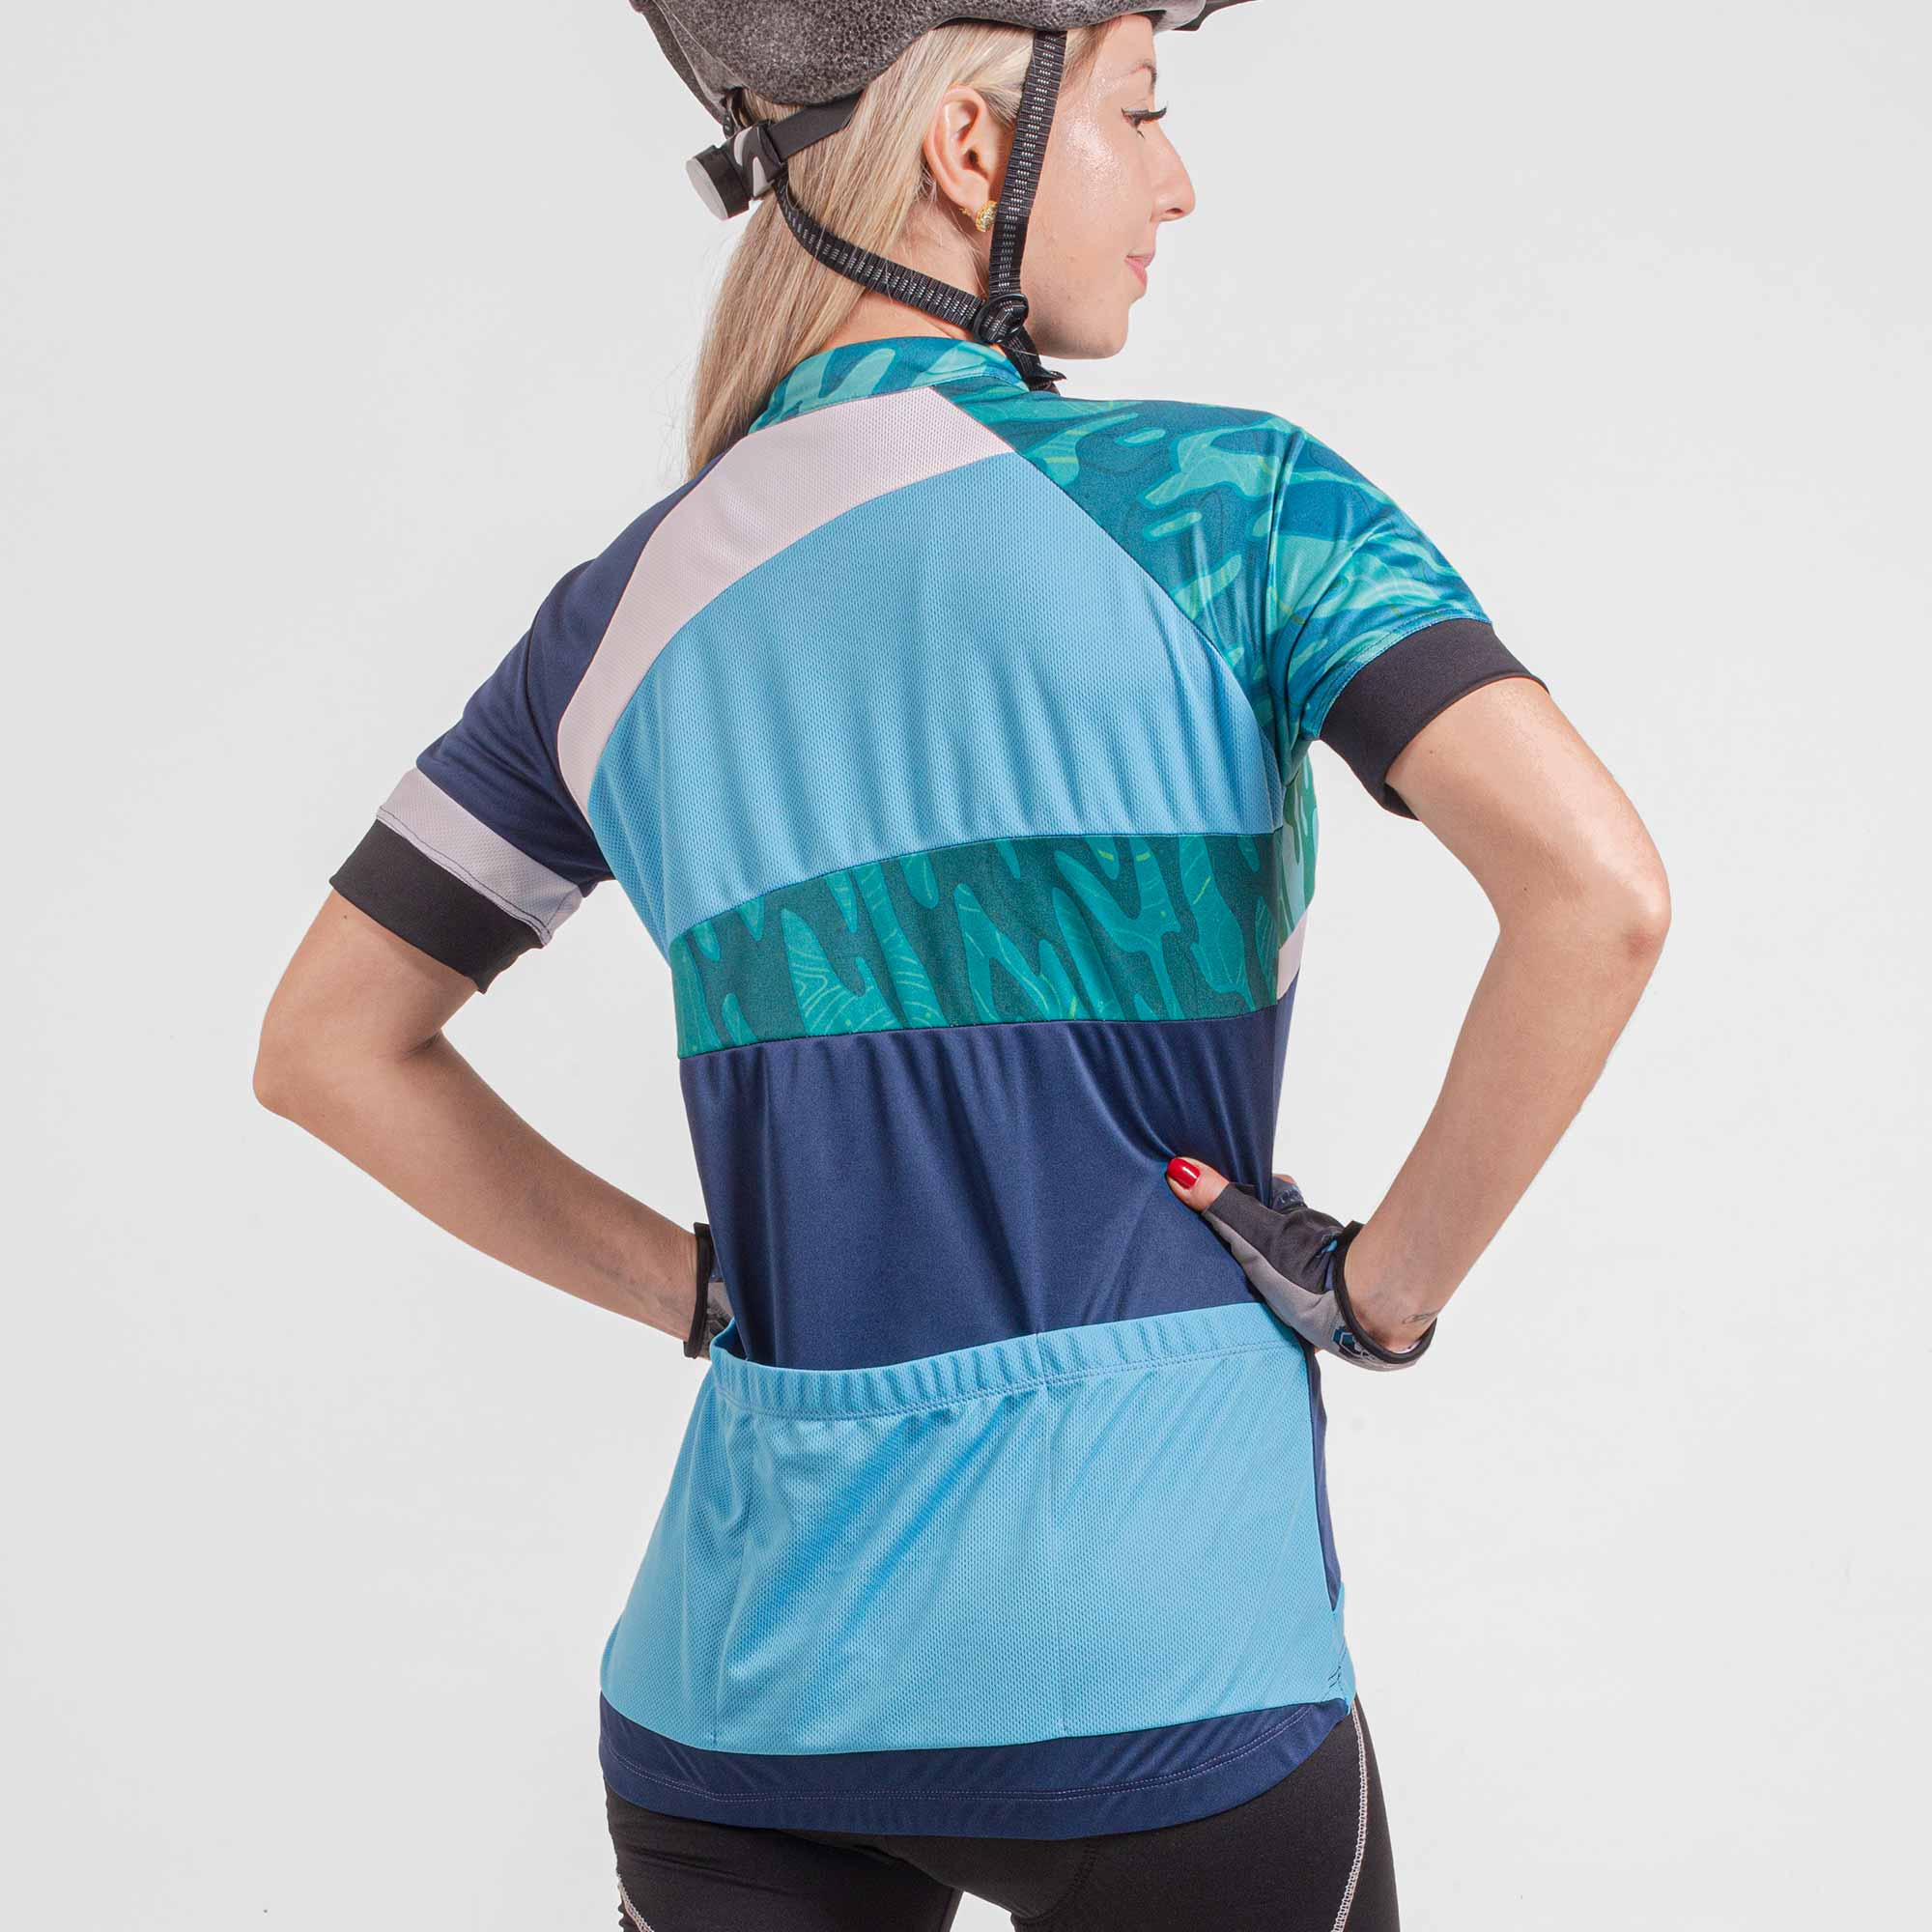 Camisa Ciclista Manga Curta Zíper Parcial Feminina Flow 04292